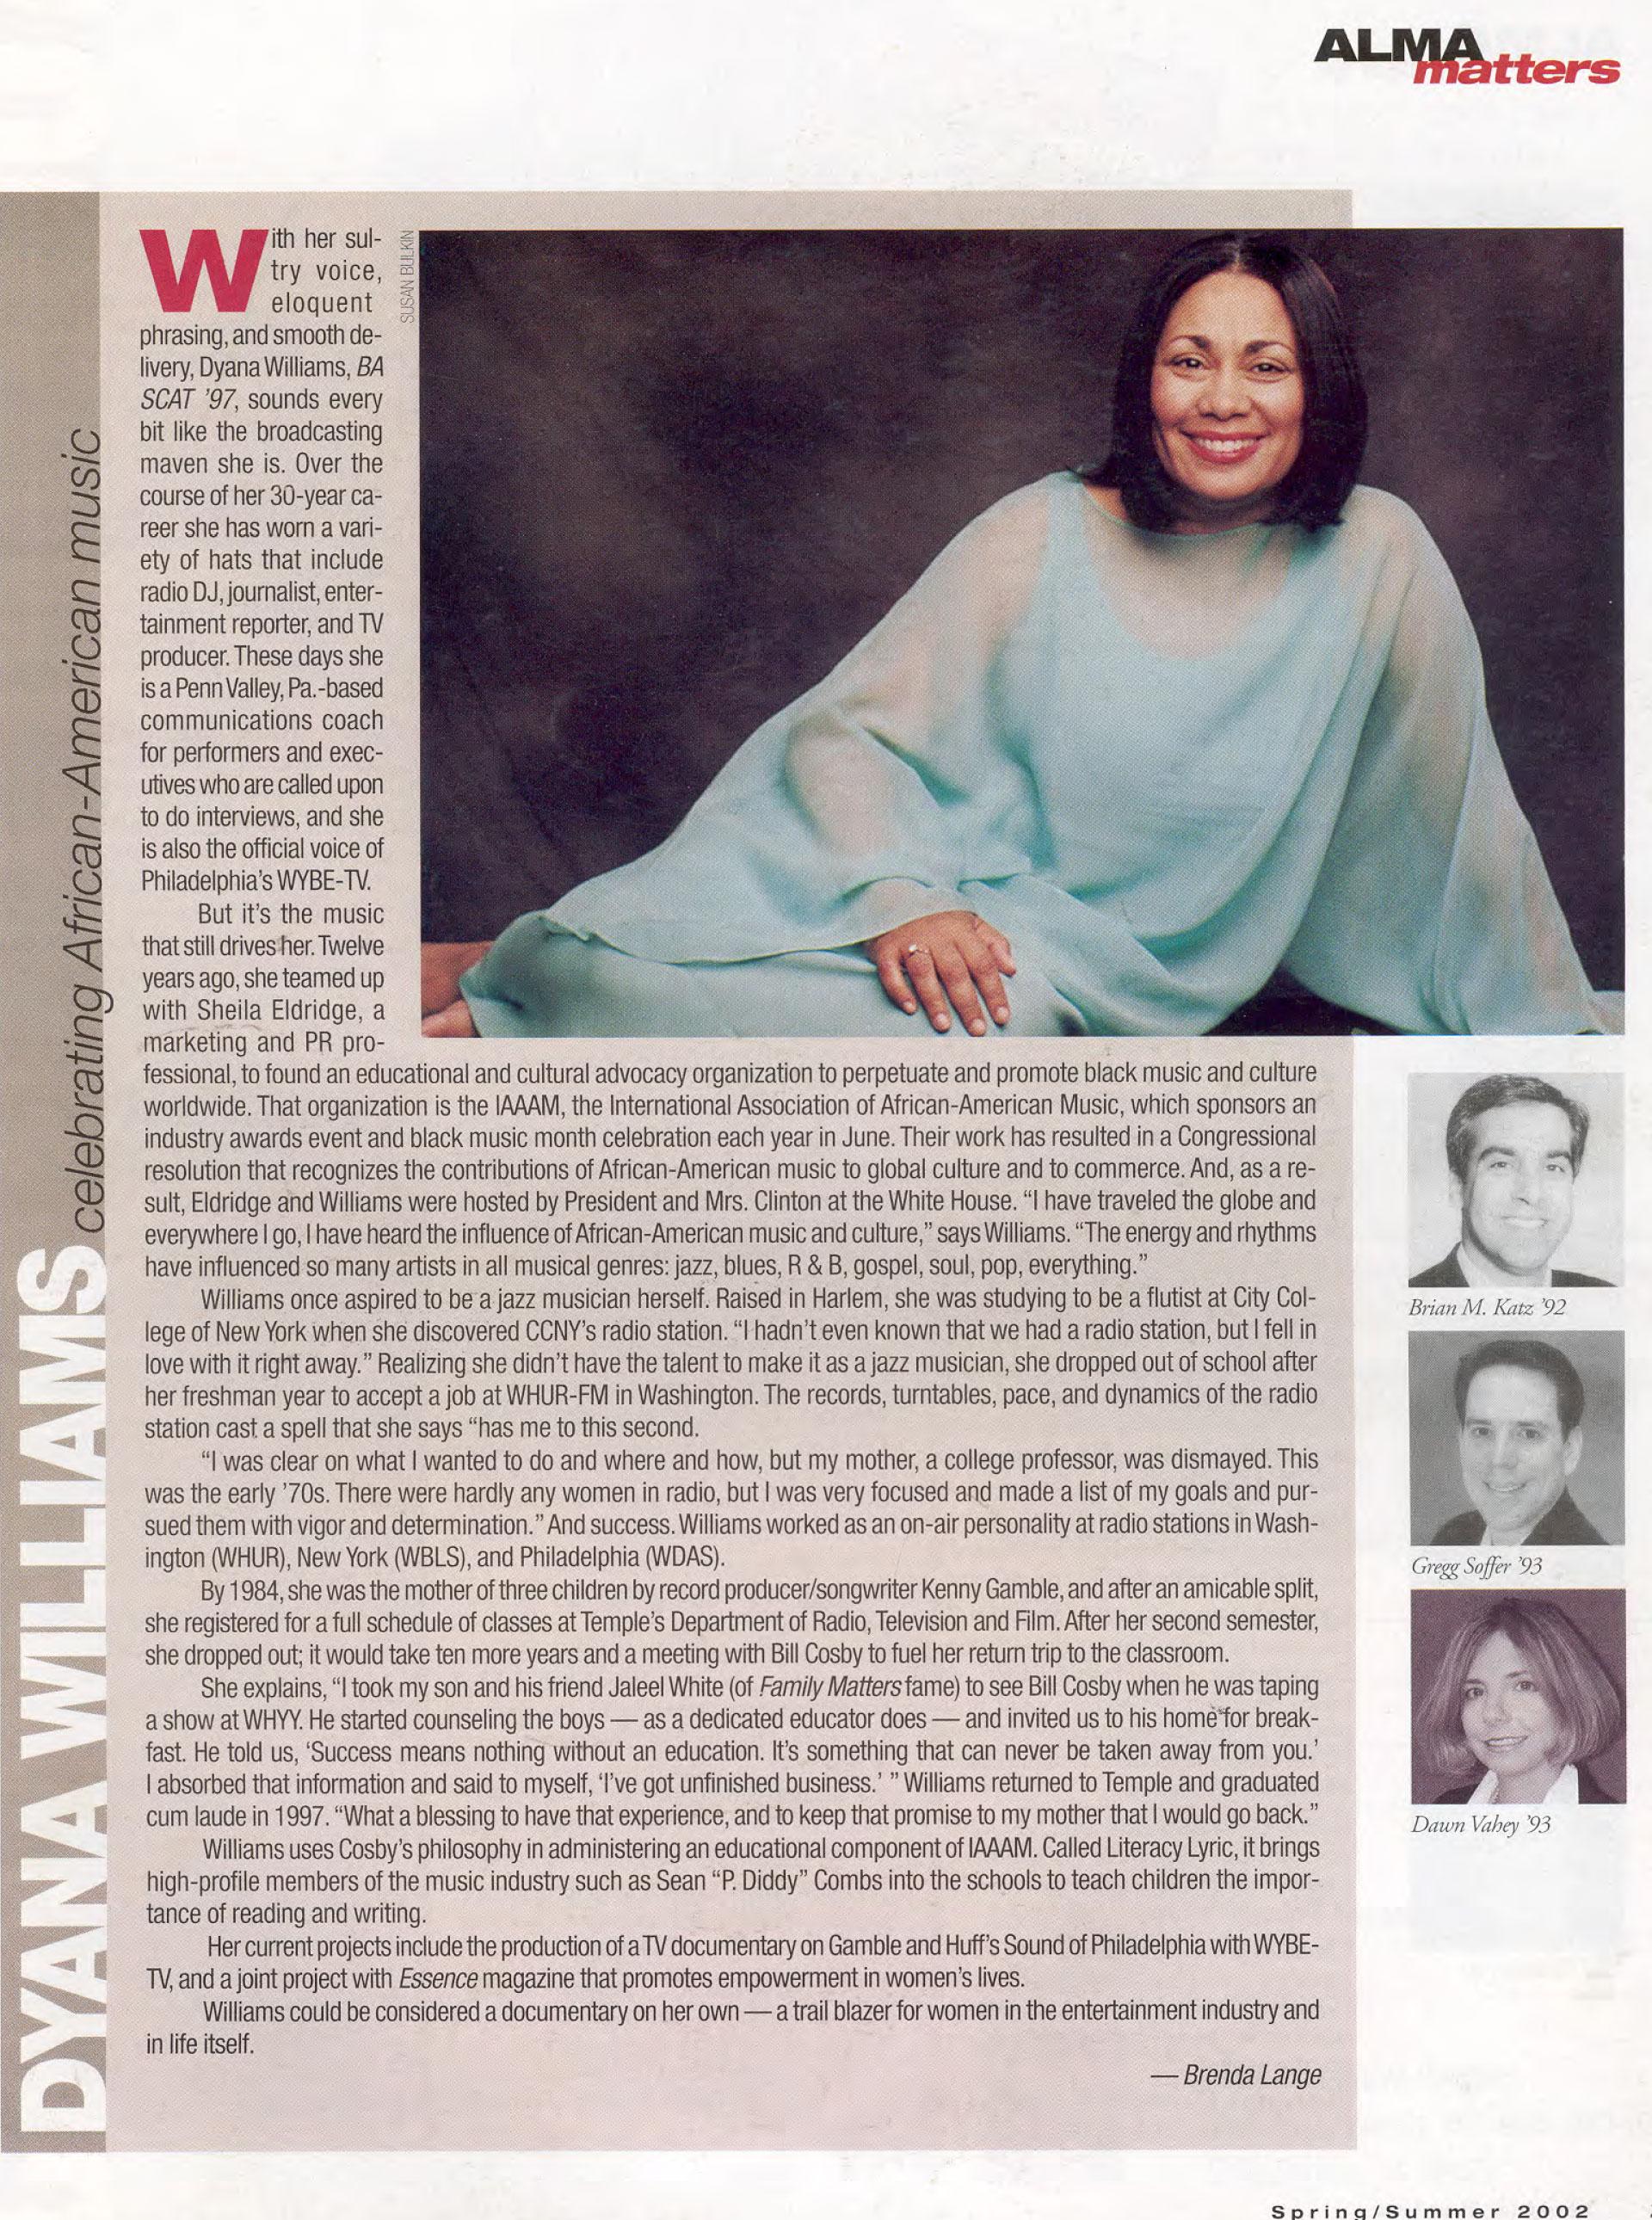 Dyana Wiliams profile